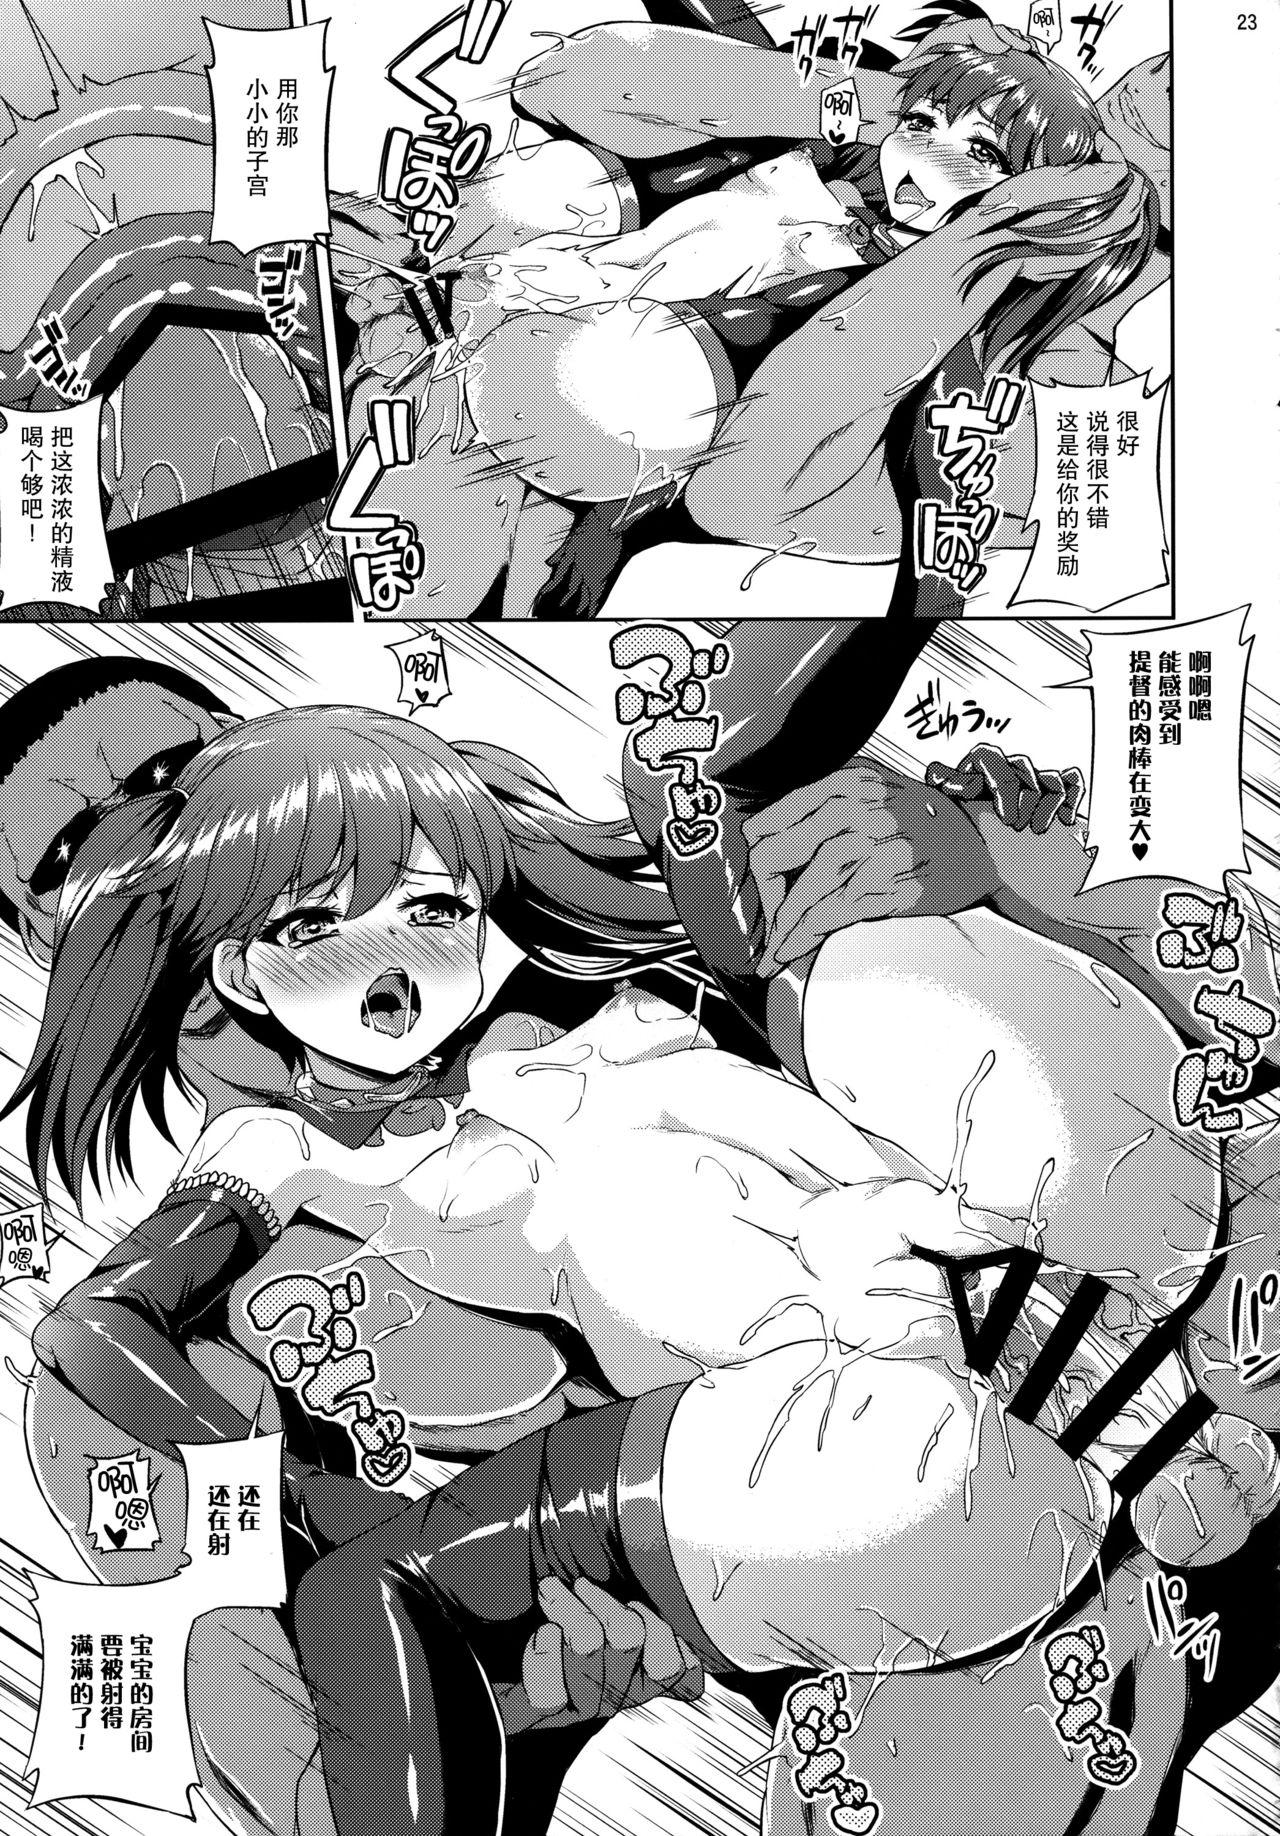 Ganbatte Leveling shita Kekka Inran ni Sodatta Ryuujou-chan 24